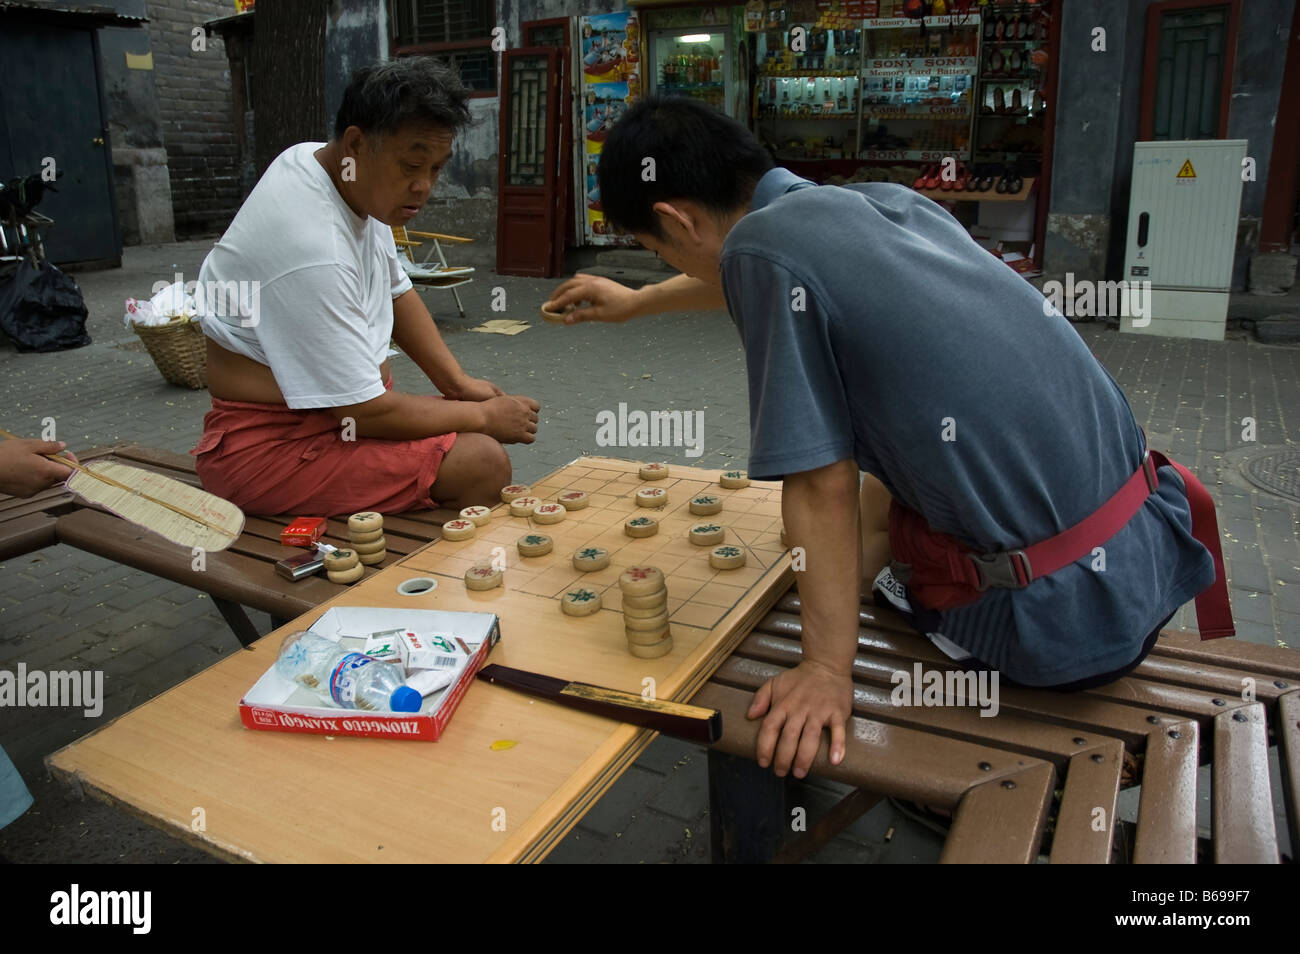 Two men playing chinese chess (xiangqi) - Stock Image